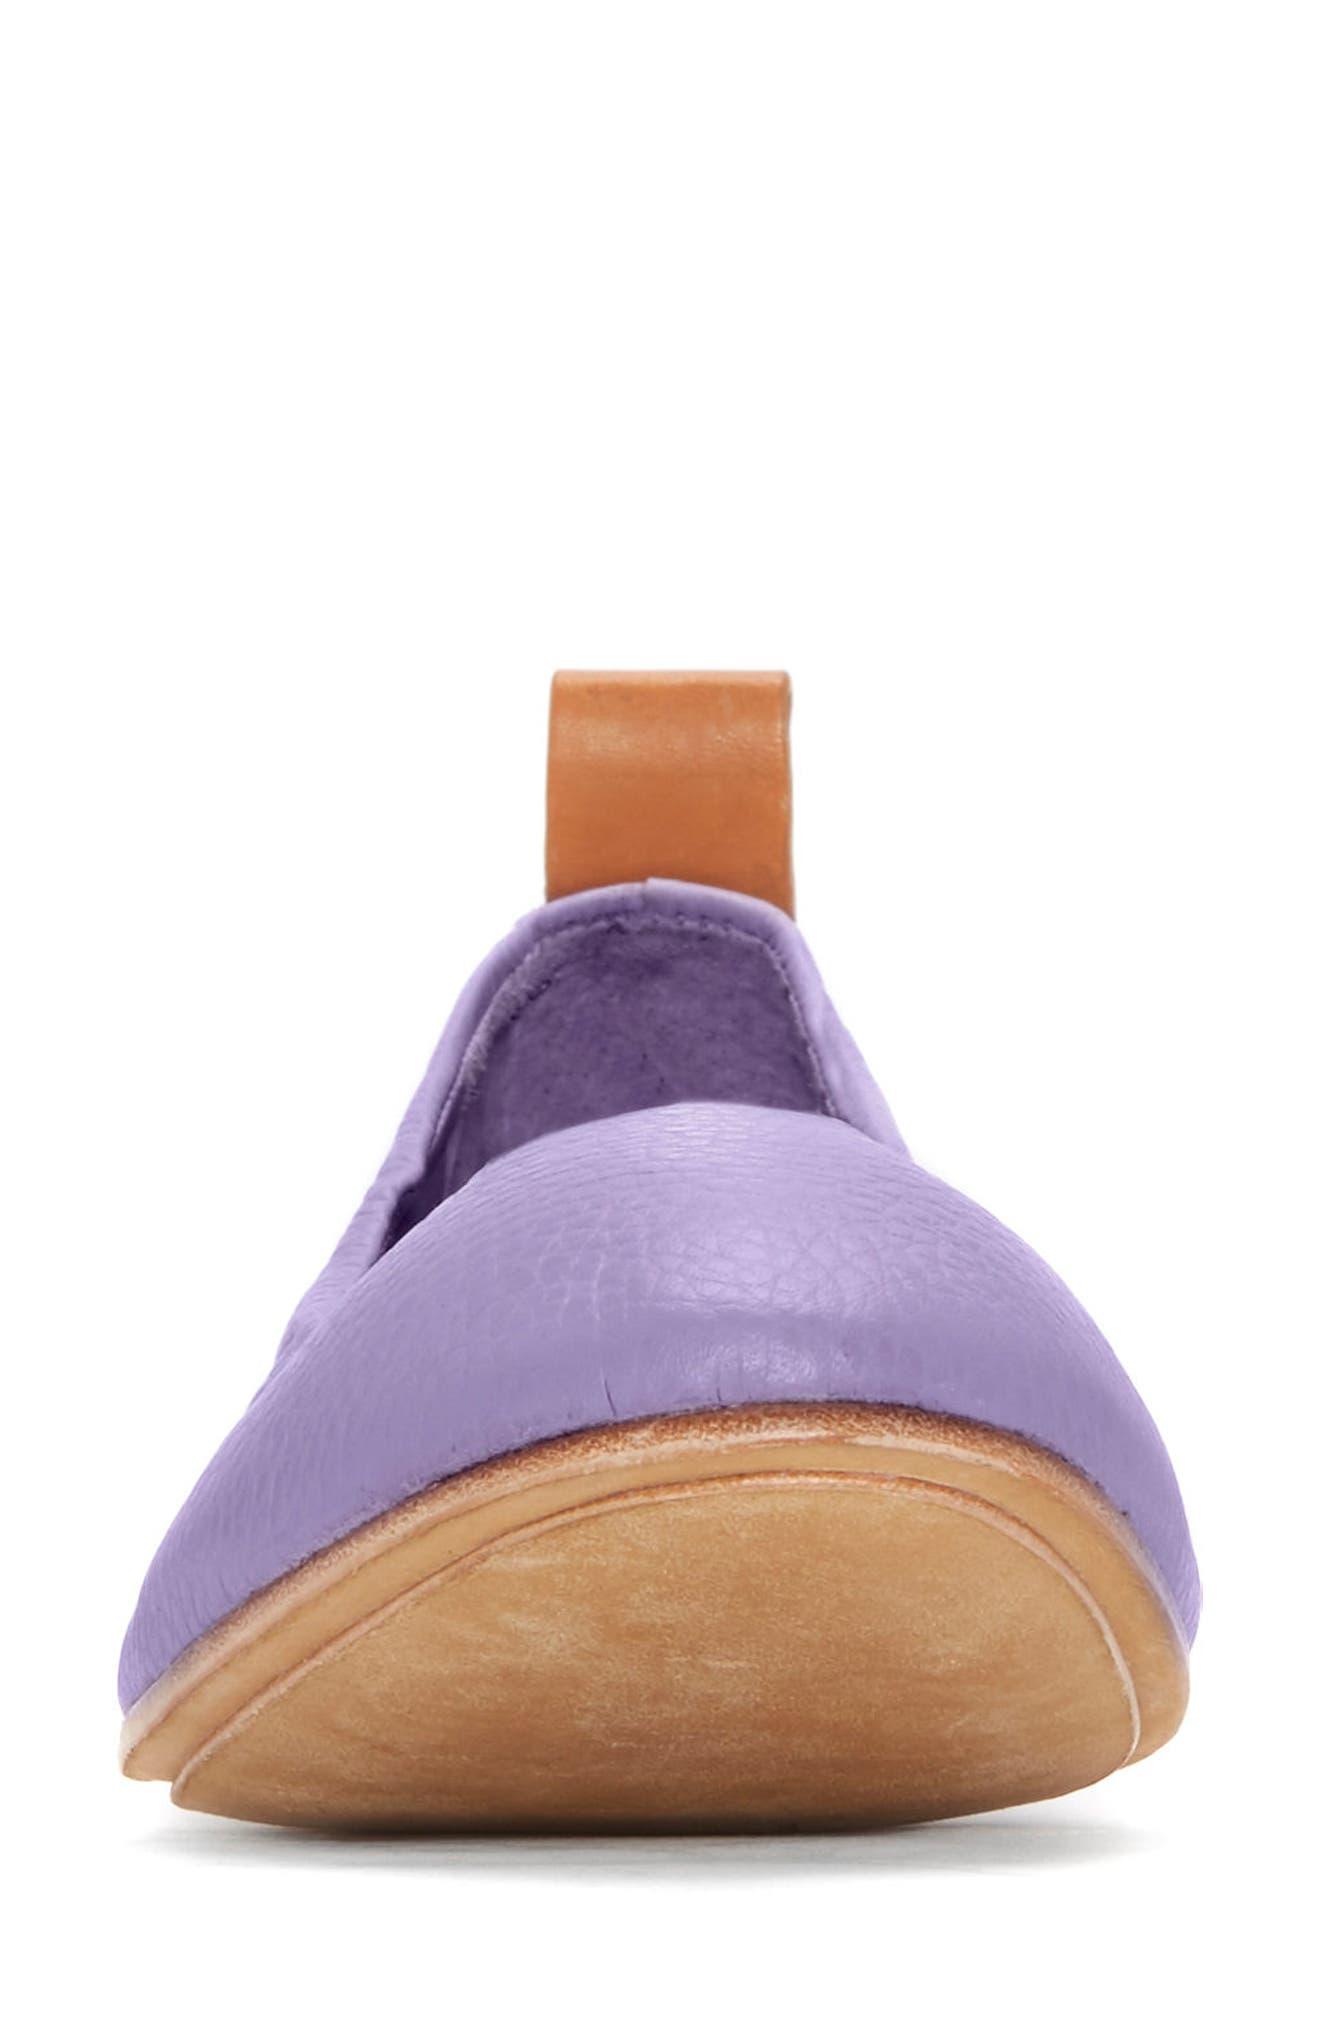 Carola Ballet Flat,                             Alternate thumbnail 3, color,                             Lavender